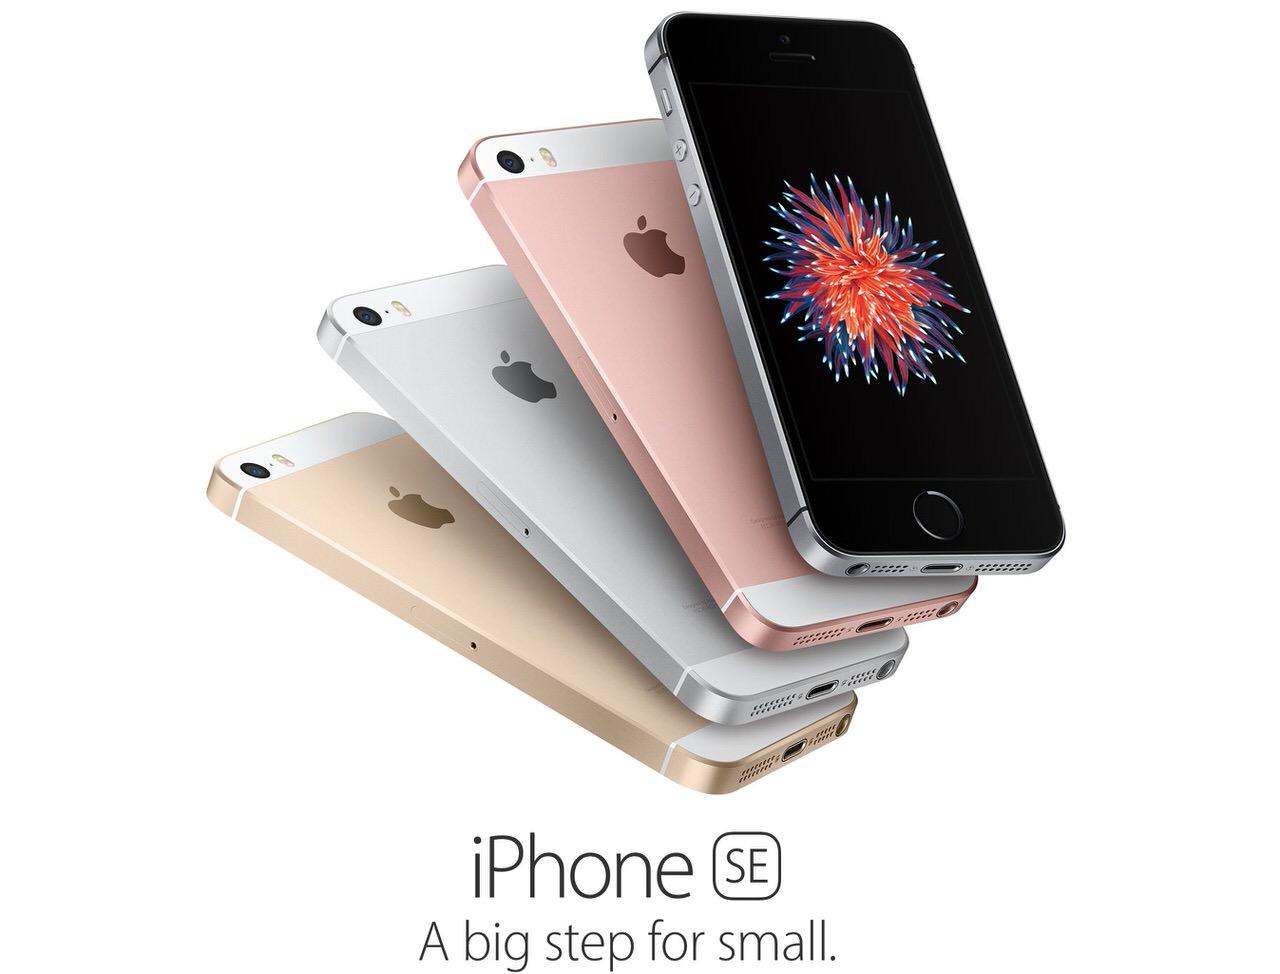 SIMフリー版iPhoneが一斉に値下げ  〜iPhone SE 16GBは5,000円の値下げ、最大幅は9,000円